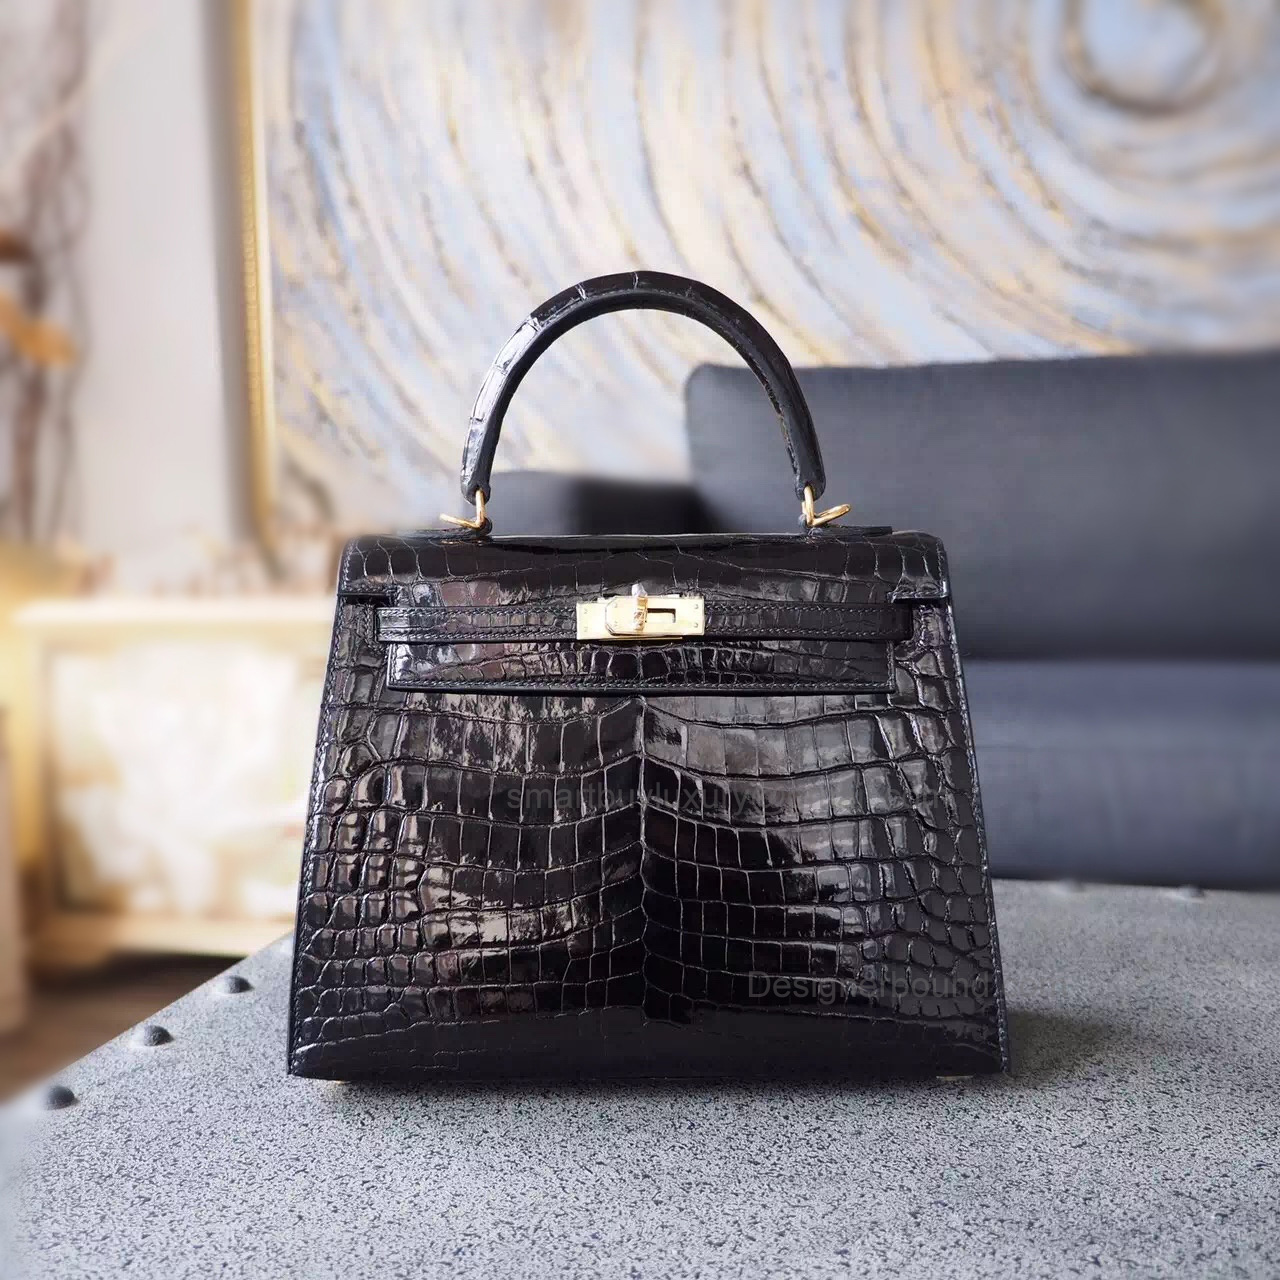 Replica Hermes Kelly 25 Handmade Bag in ck89 Noir Shining Niloticus Croc GHW b6941bd113928